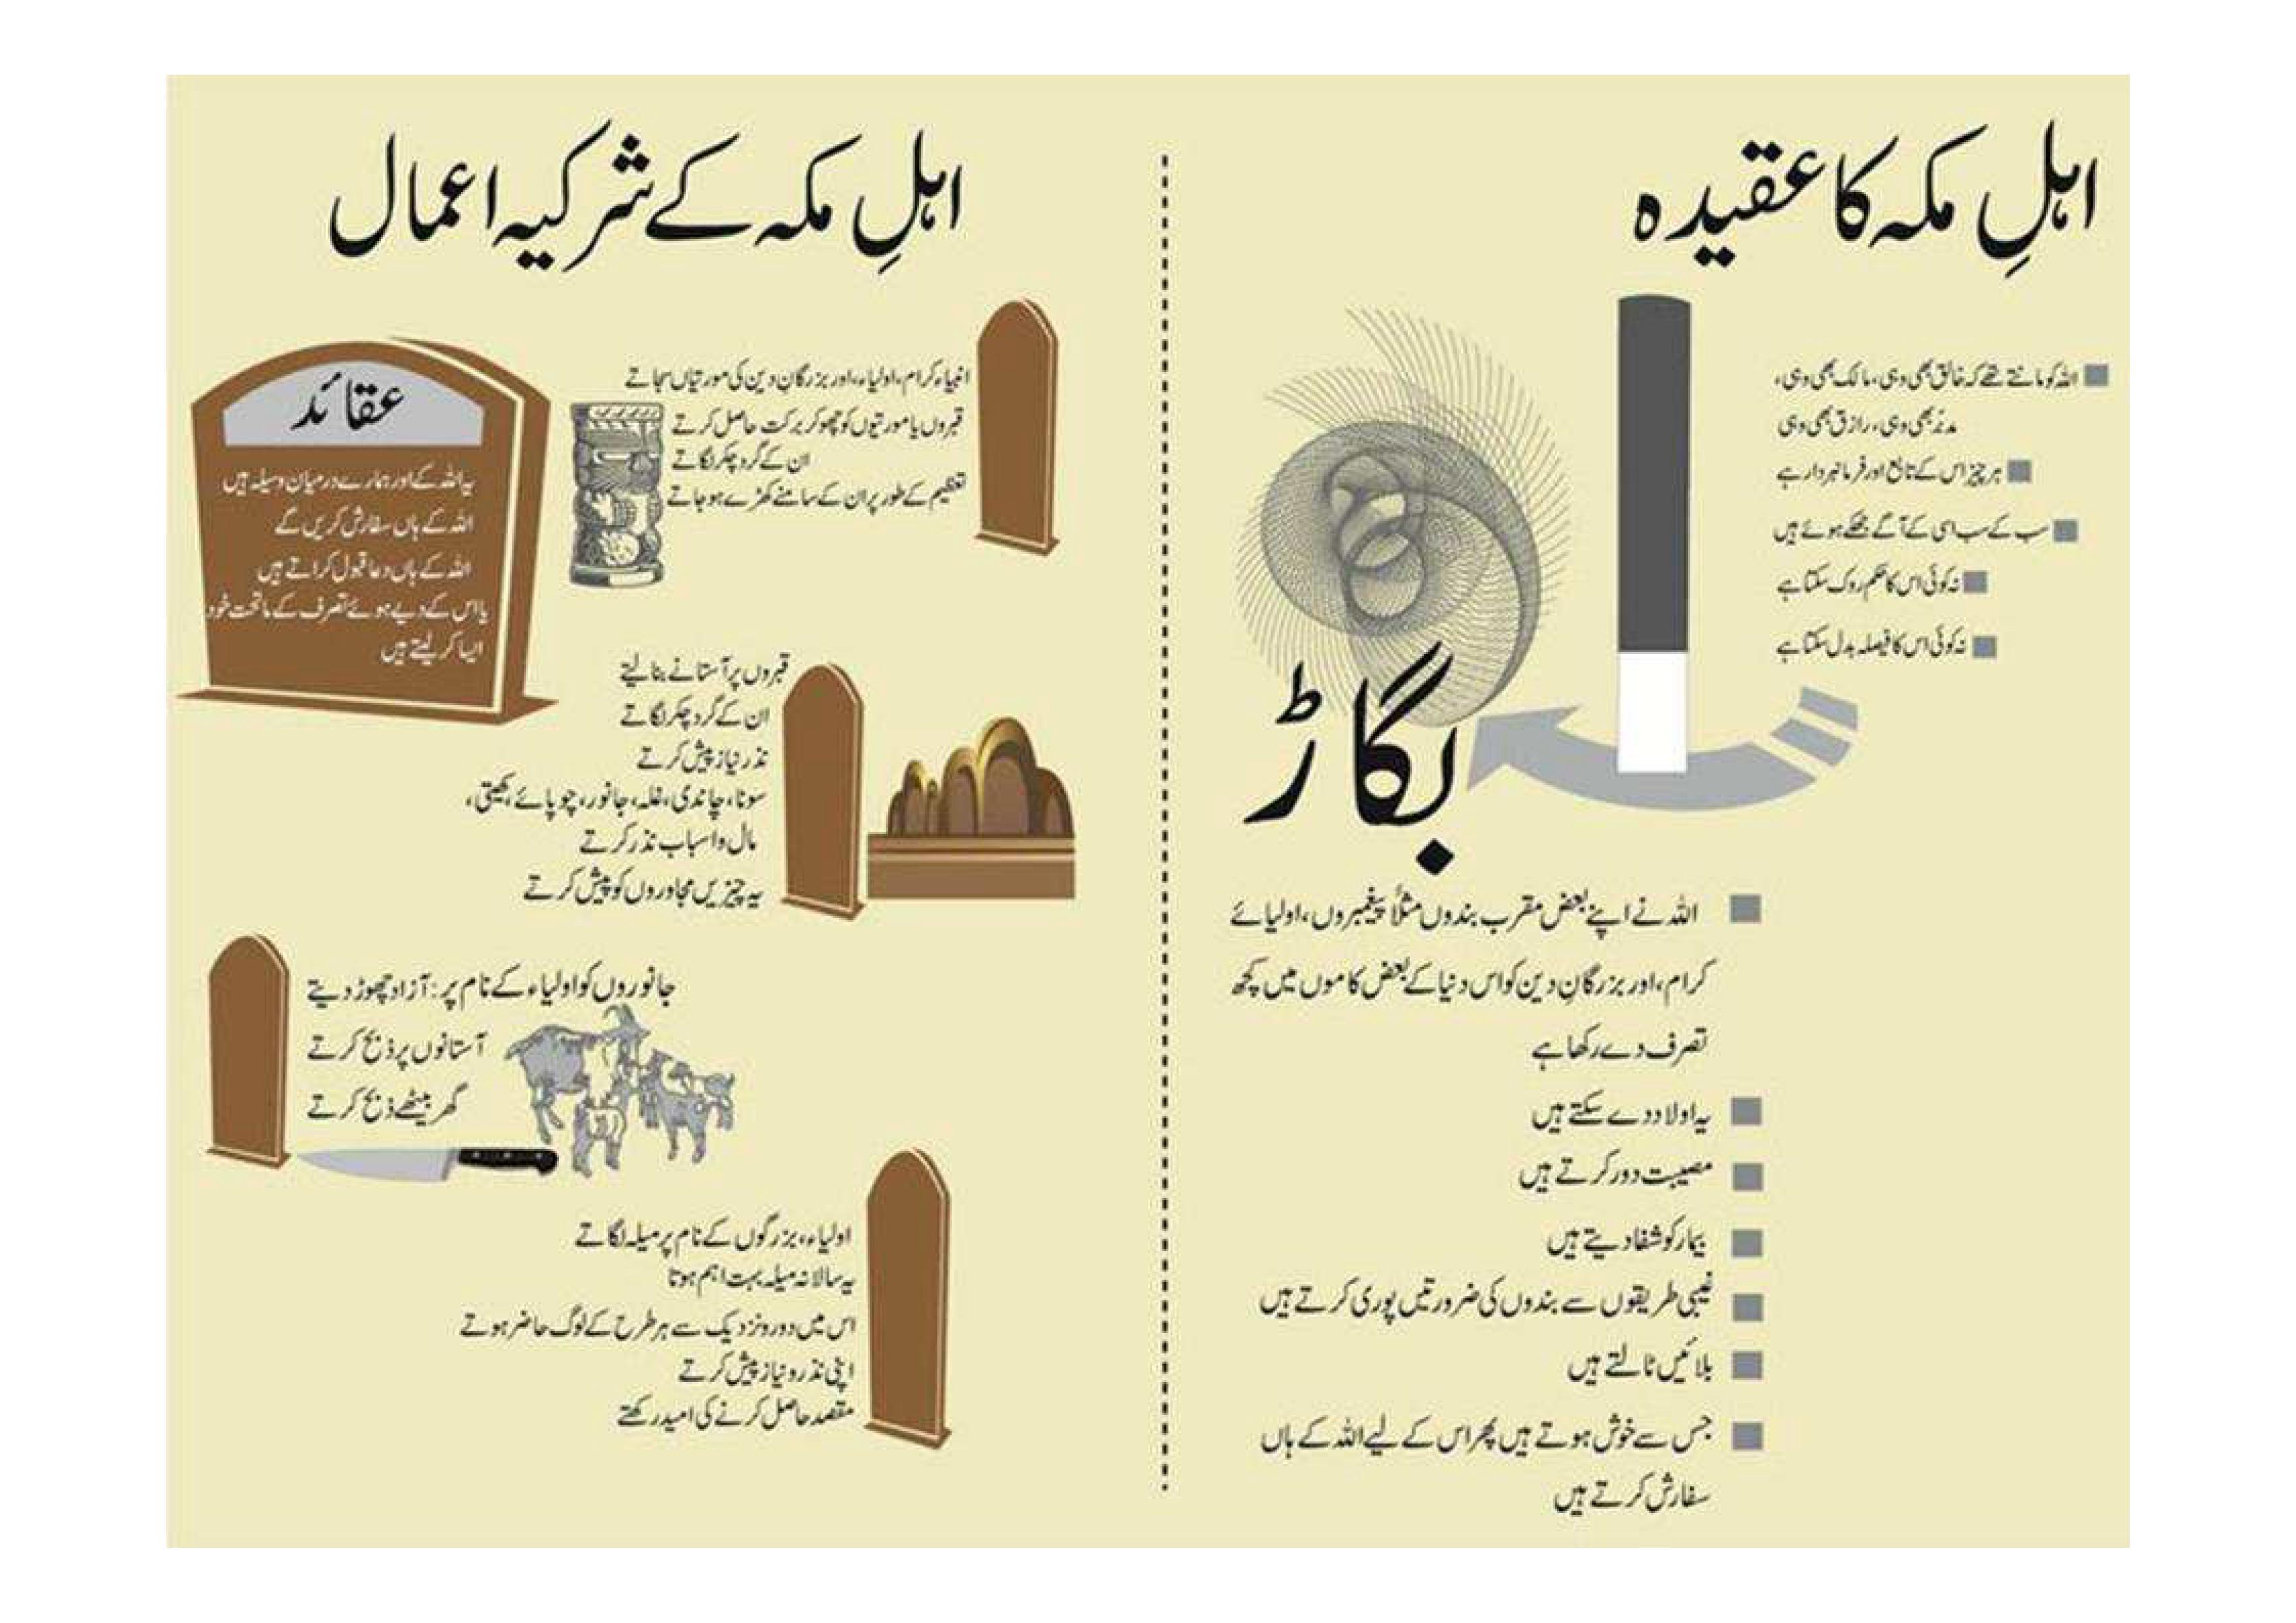 Seerat Nabawi Life of Prophet Mohammad pbuh by Kathir Khaldun